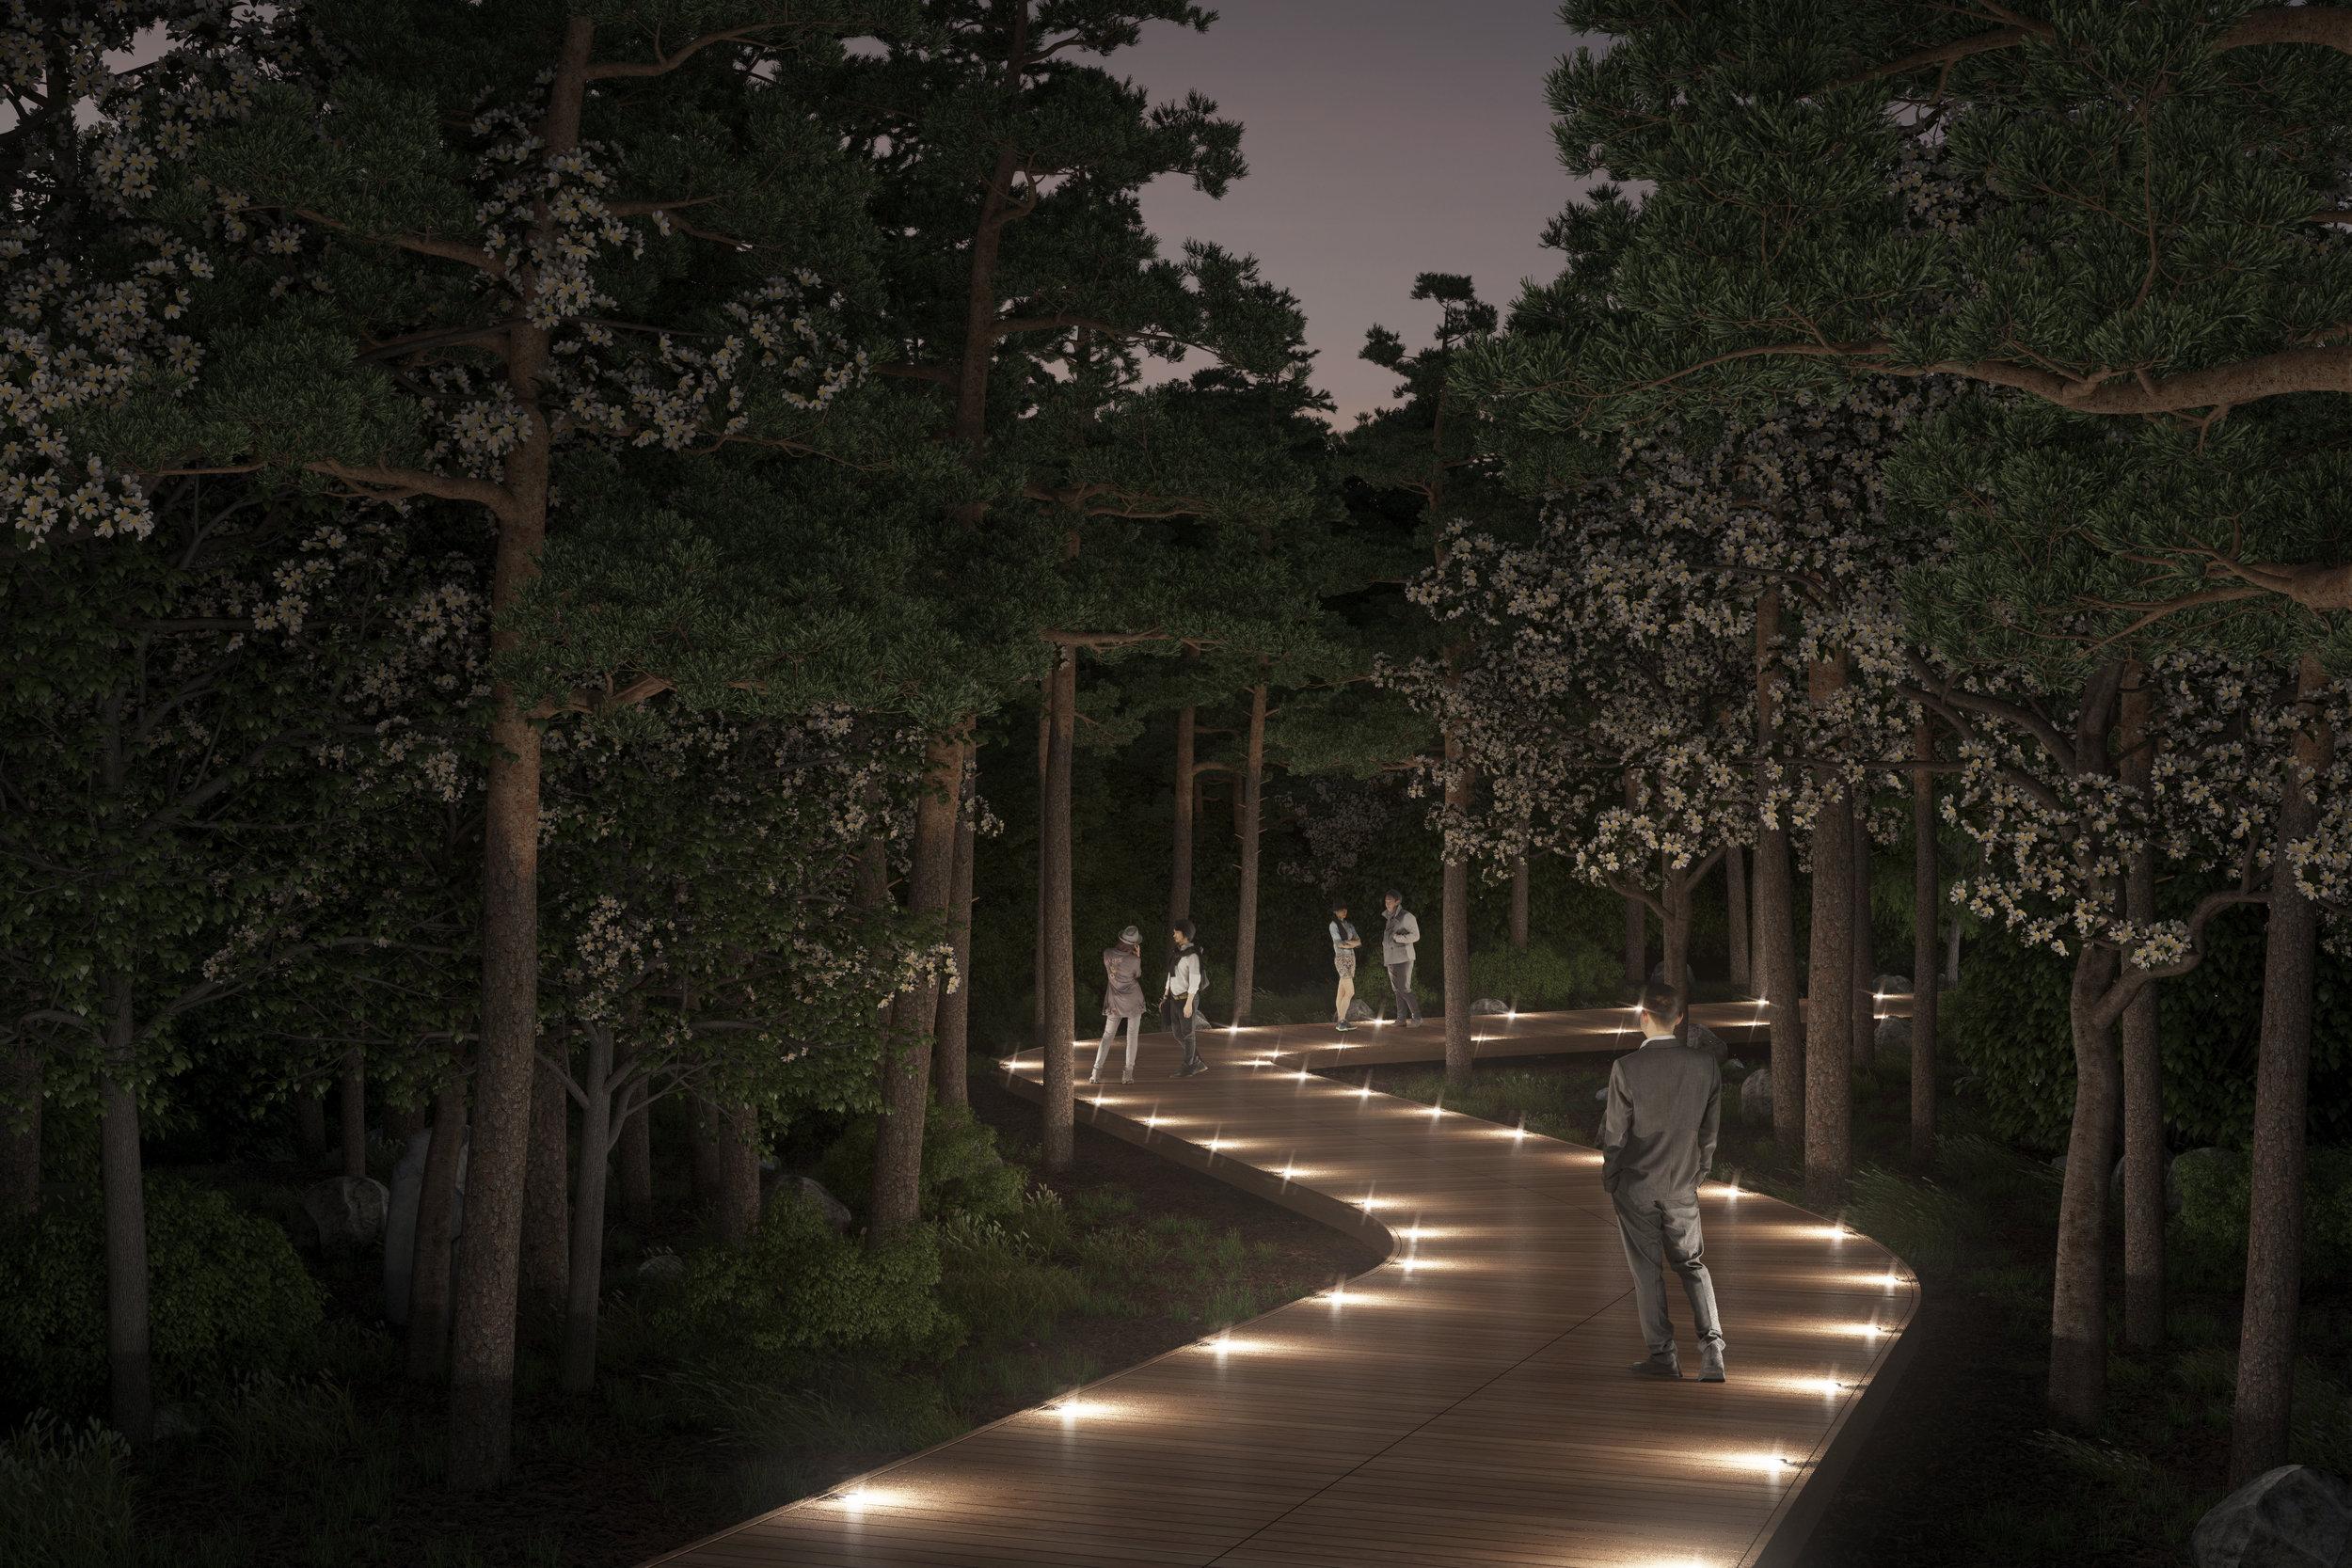 footpaths in forest night.jpg